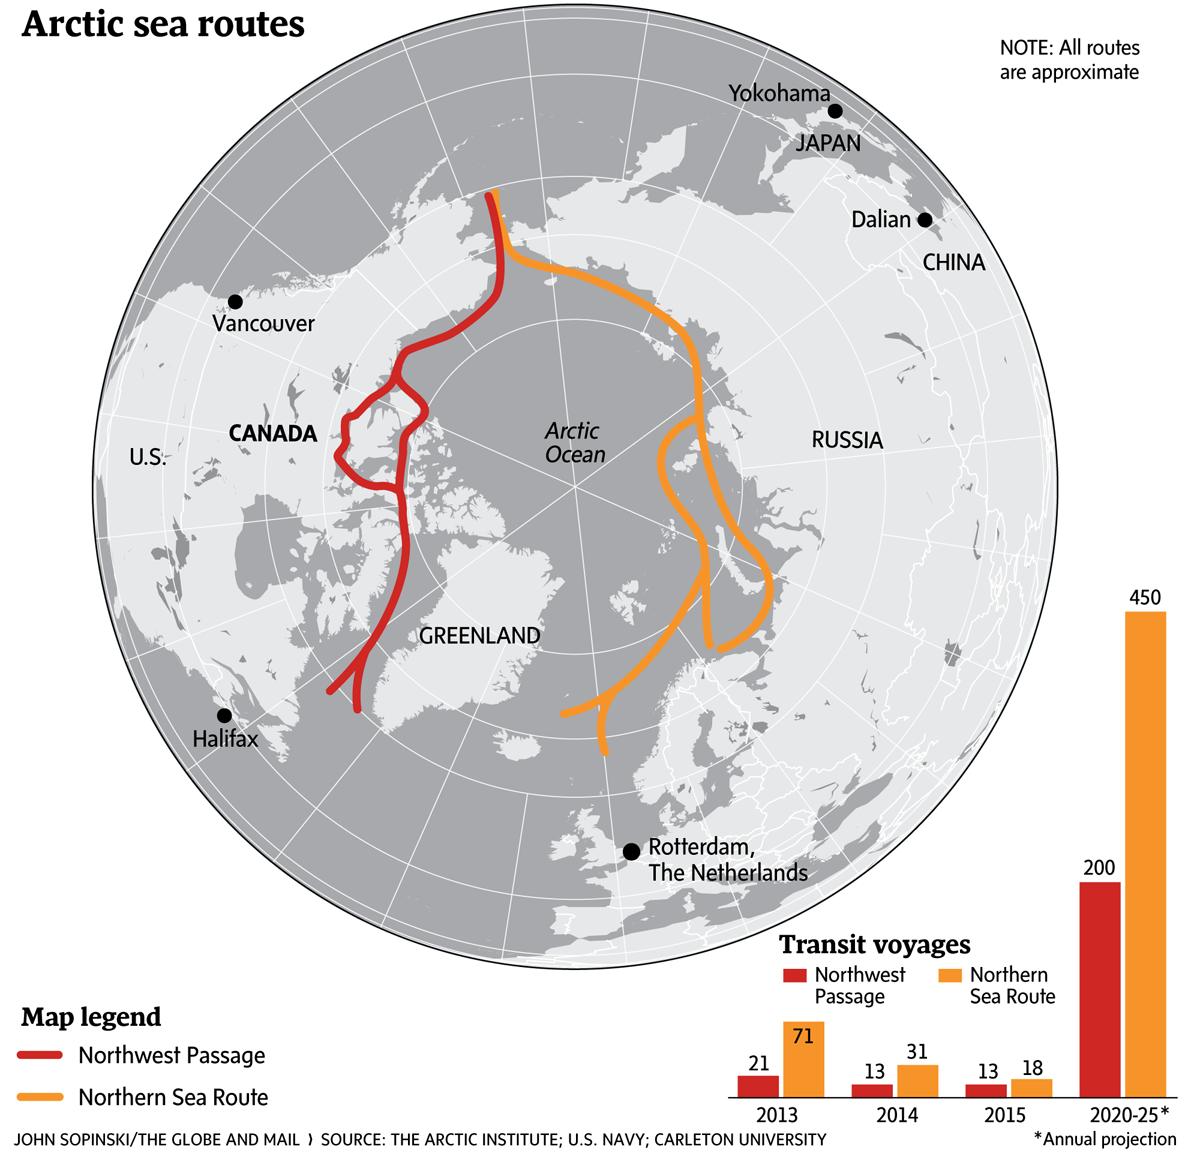 MM-globeandmail_arcticsearoutes-Future-CanadianGeographic